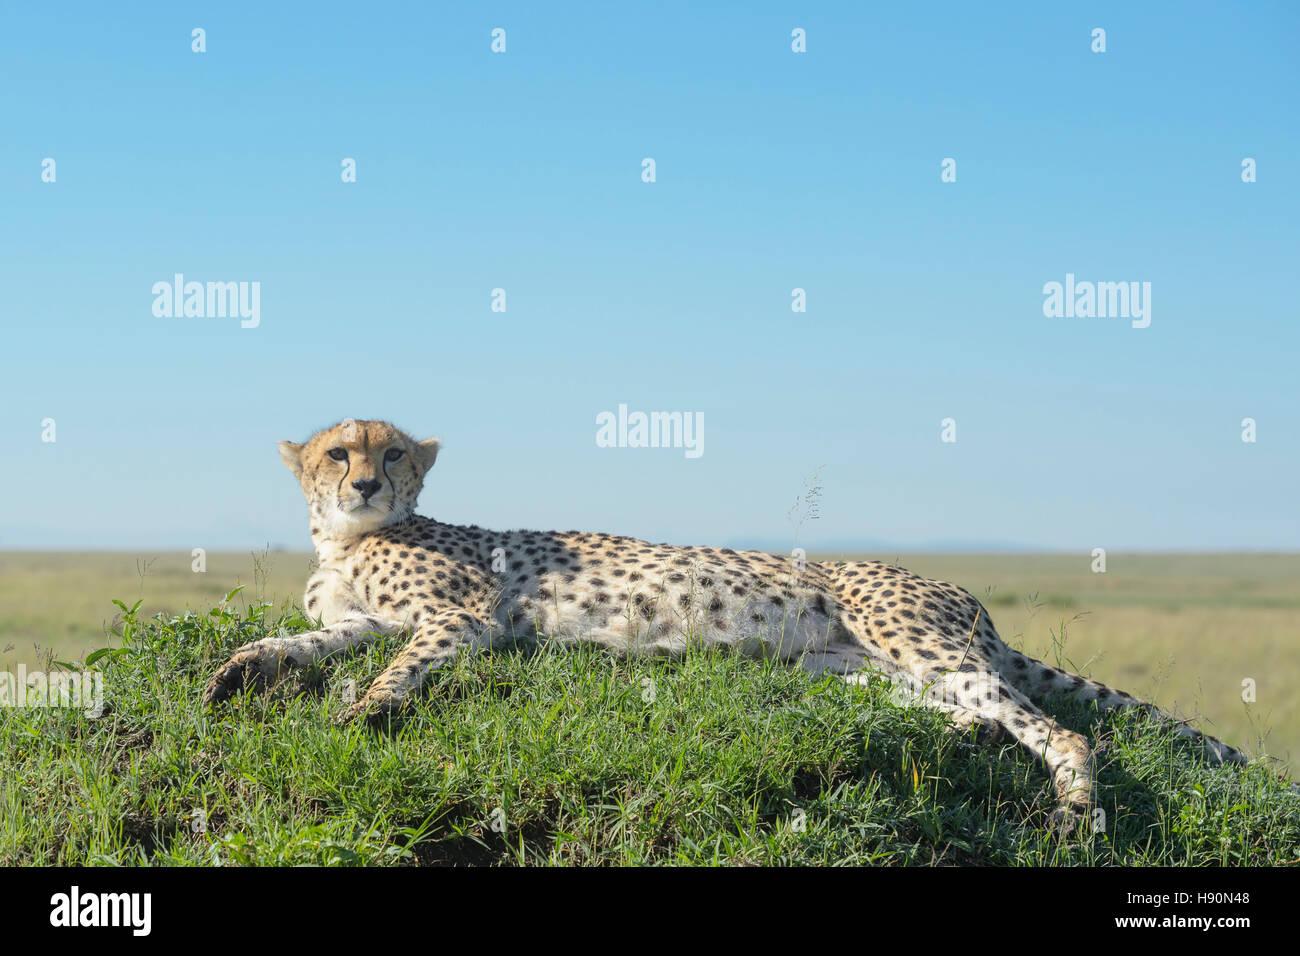 Cheetah (Acinonix jubatus) lying down on hill in savanna, close up, Maasai Mara National Reserve, Kenya - Stock Image